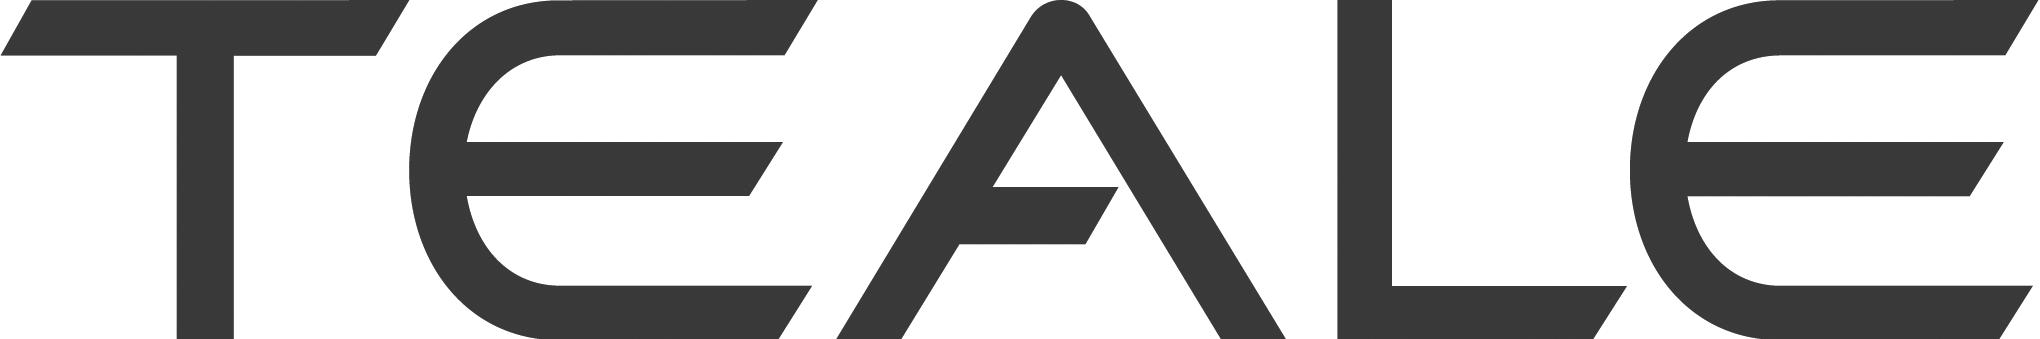 Teale logo B&W